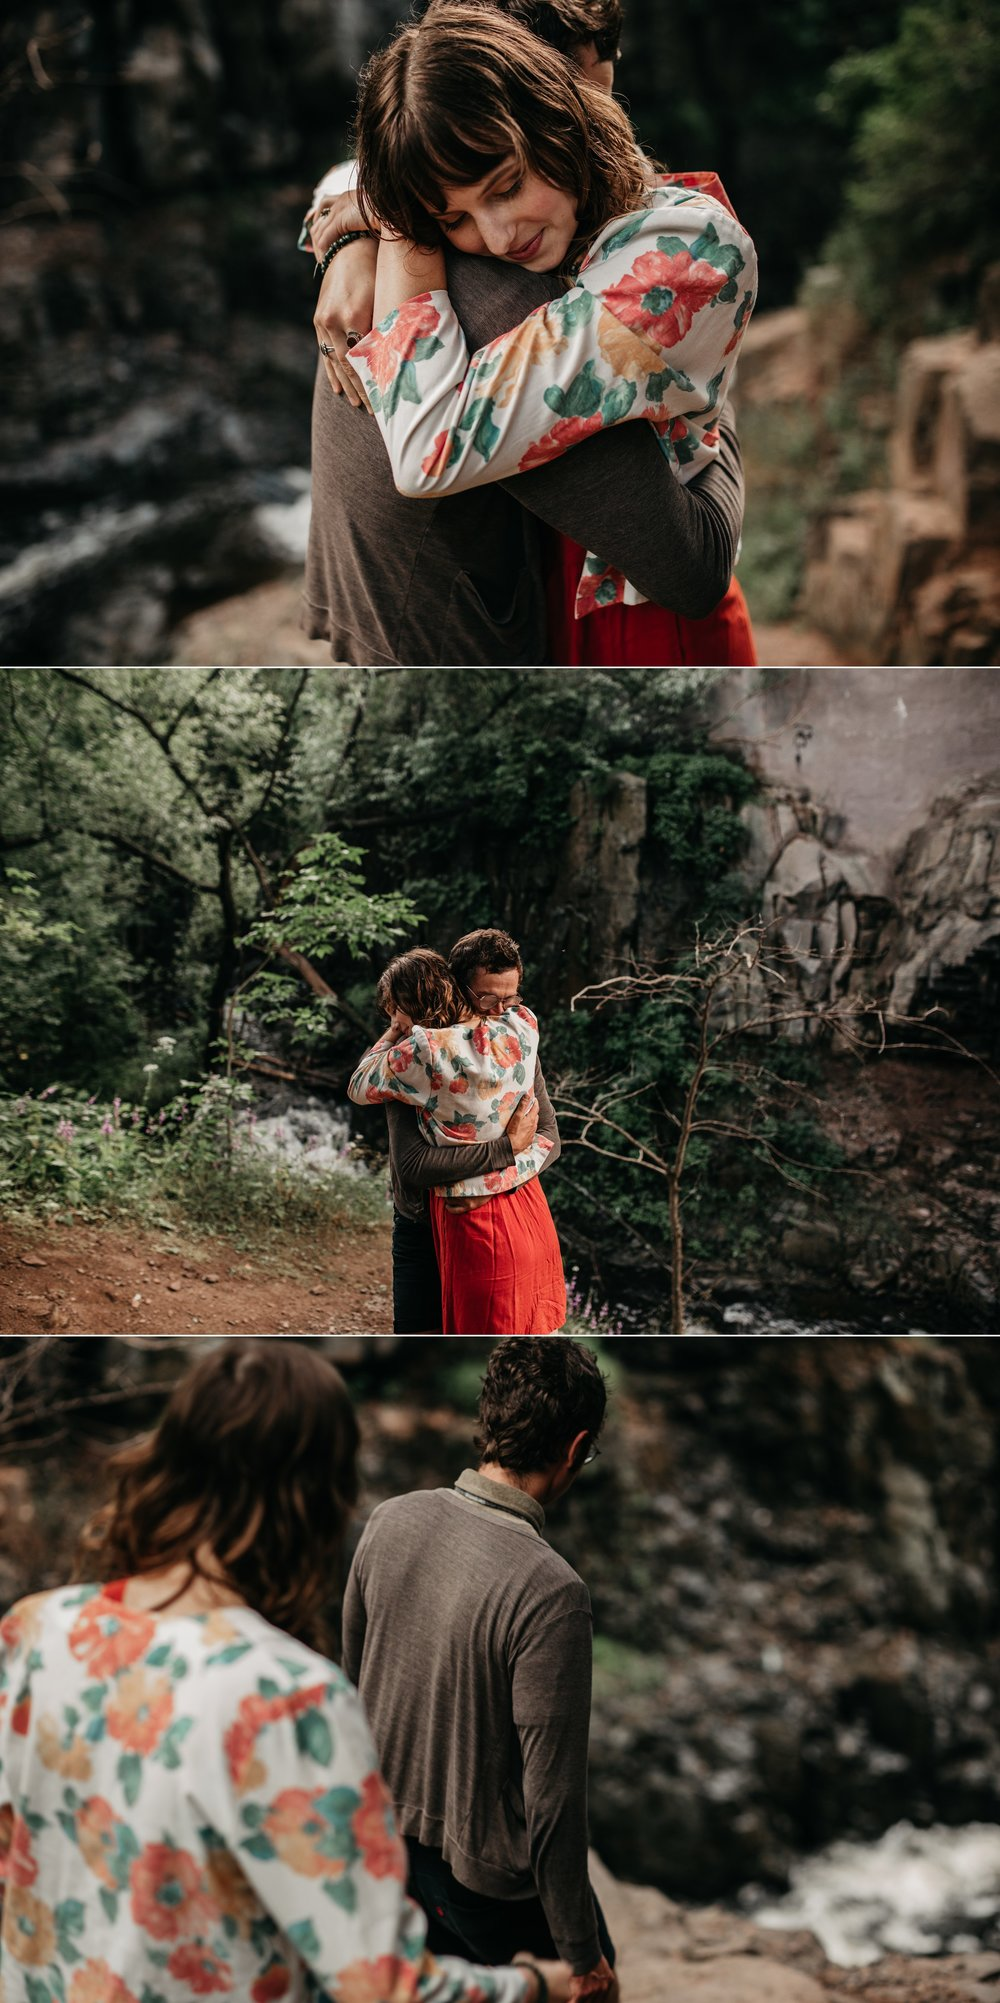 mandy-aaron-austin-minnesota-minneapolis-wedding-photographer-destination-elopement-intimate-adventurous_0030.jpg